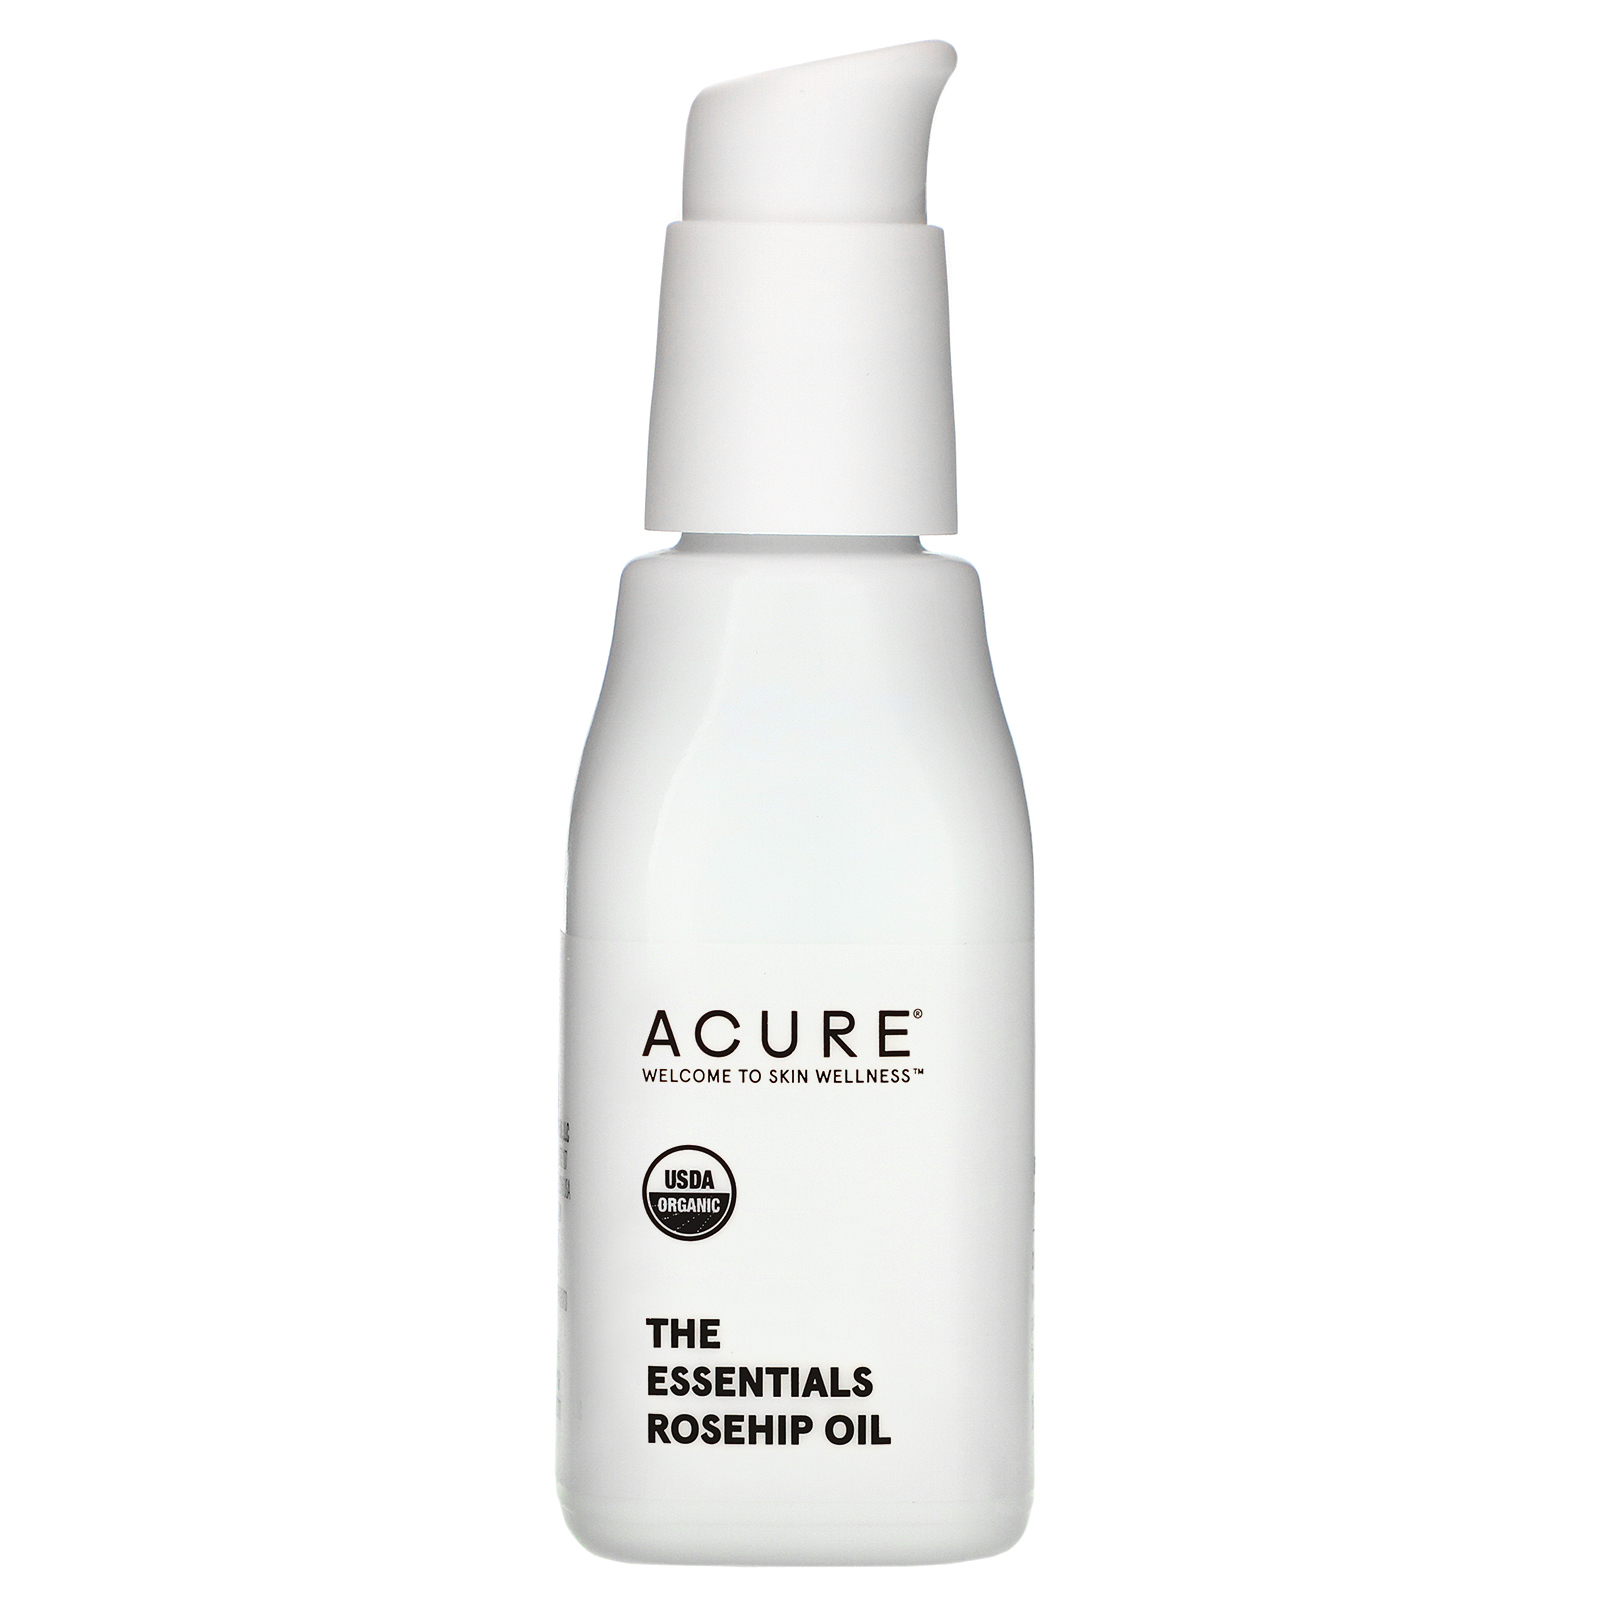 Acure, The Essentials, Rosehip Oil, 1 Fl Oz (30 Ml)